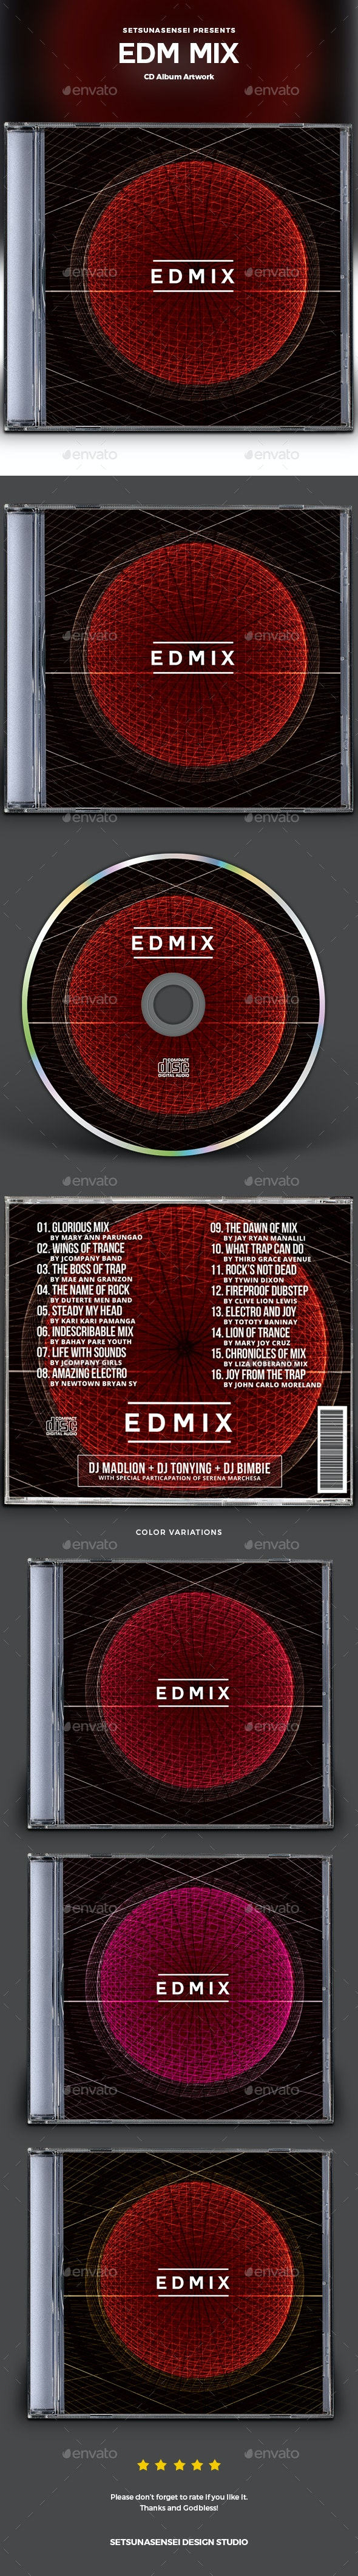 EDM Mix CD Album Artwork - CD & DVD Artwork Print Templates